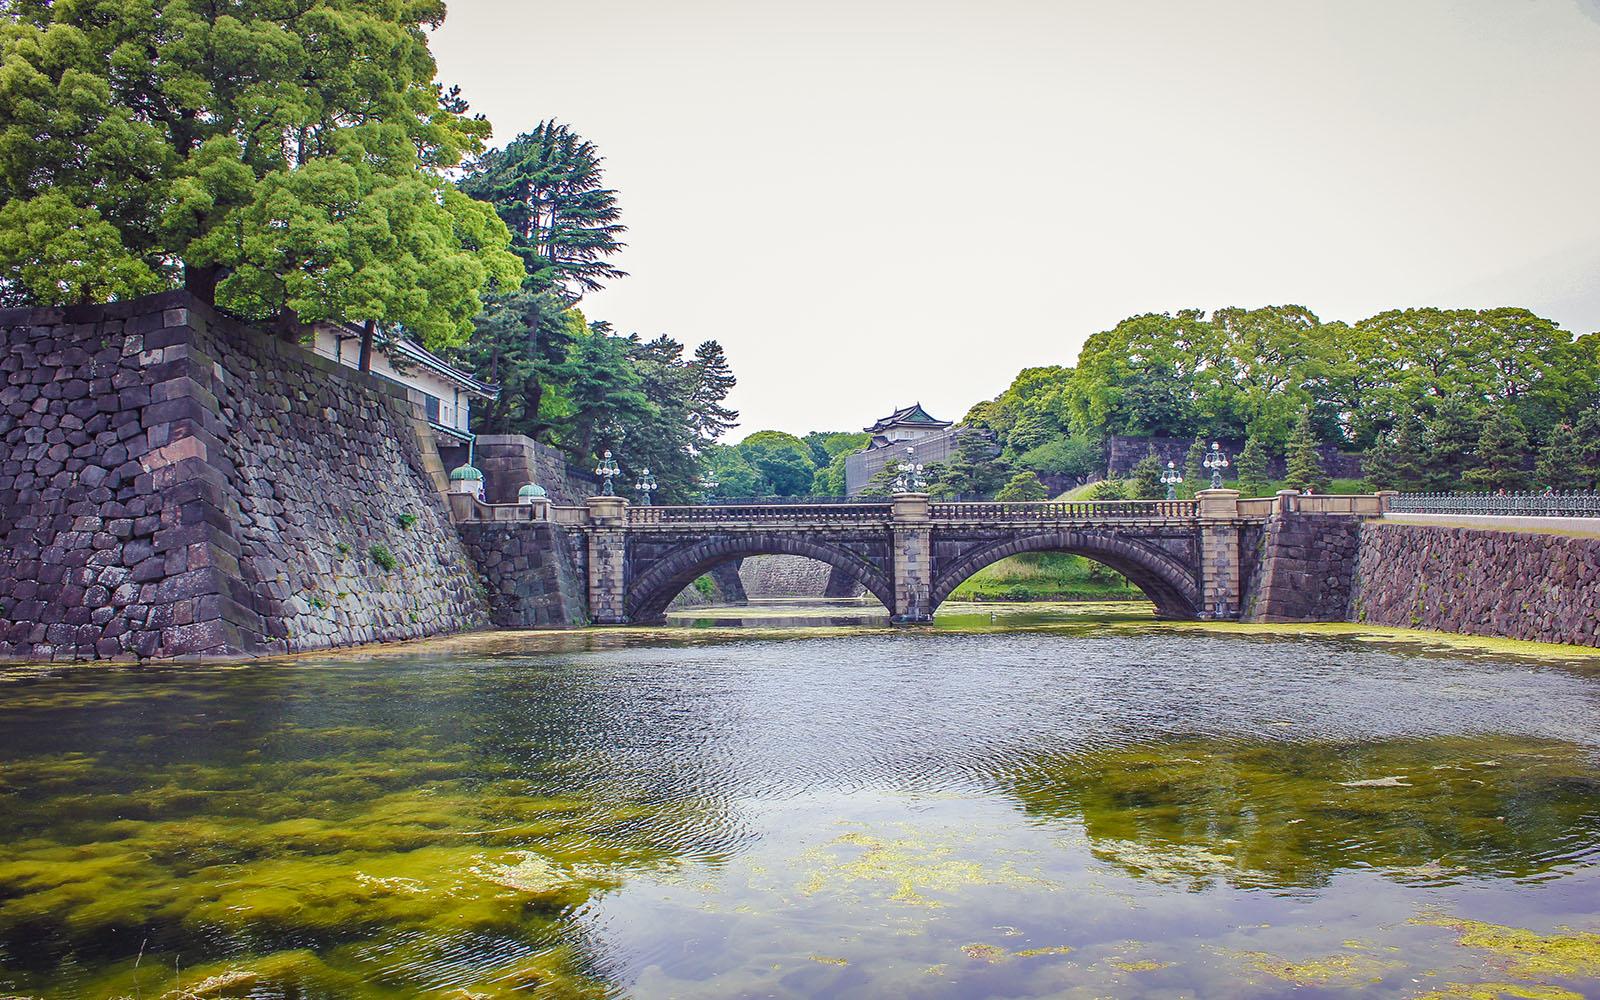 Tokyo imperial palace bridge